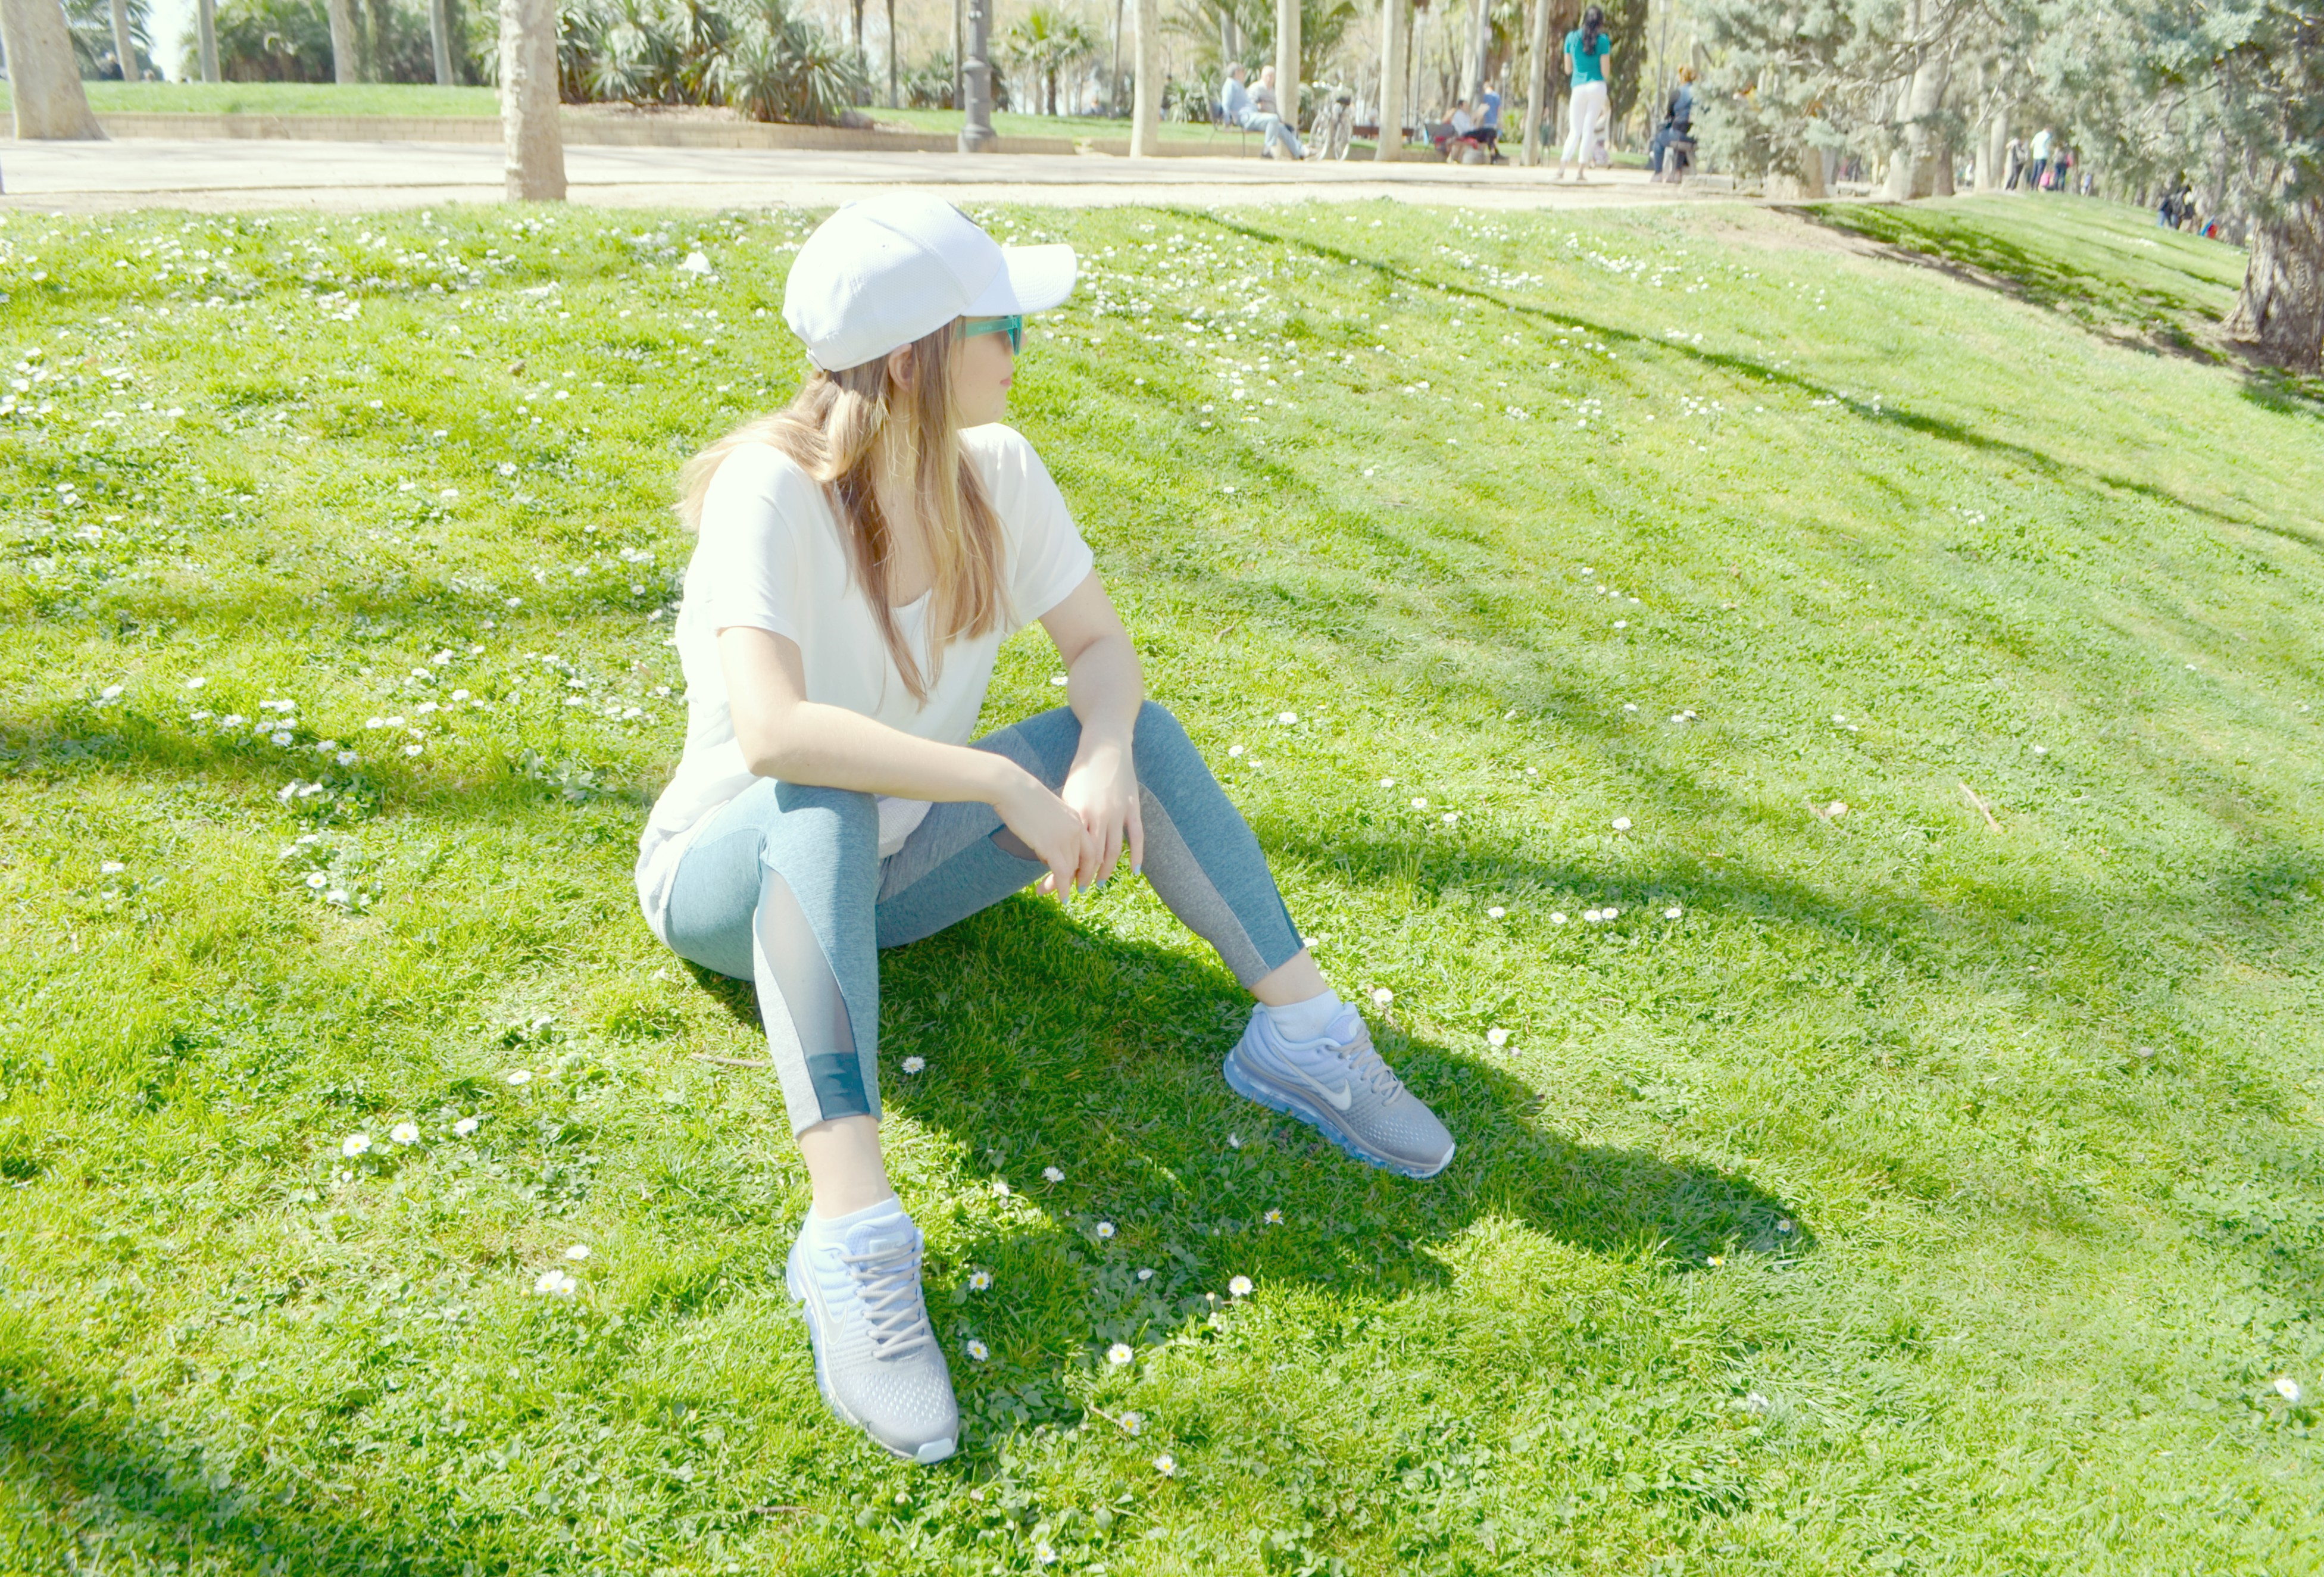 Look-fitness-ChicAdicta-blog-de-moda-Chic-Adicta-JDSports-Espana-Nike-Air-Max-correr-en-Madrid-oysho-outfit-PiensaenChic-Piensa-en-Chic